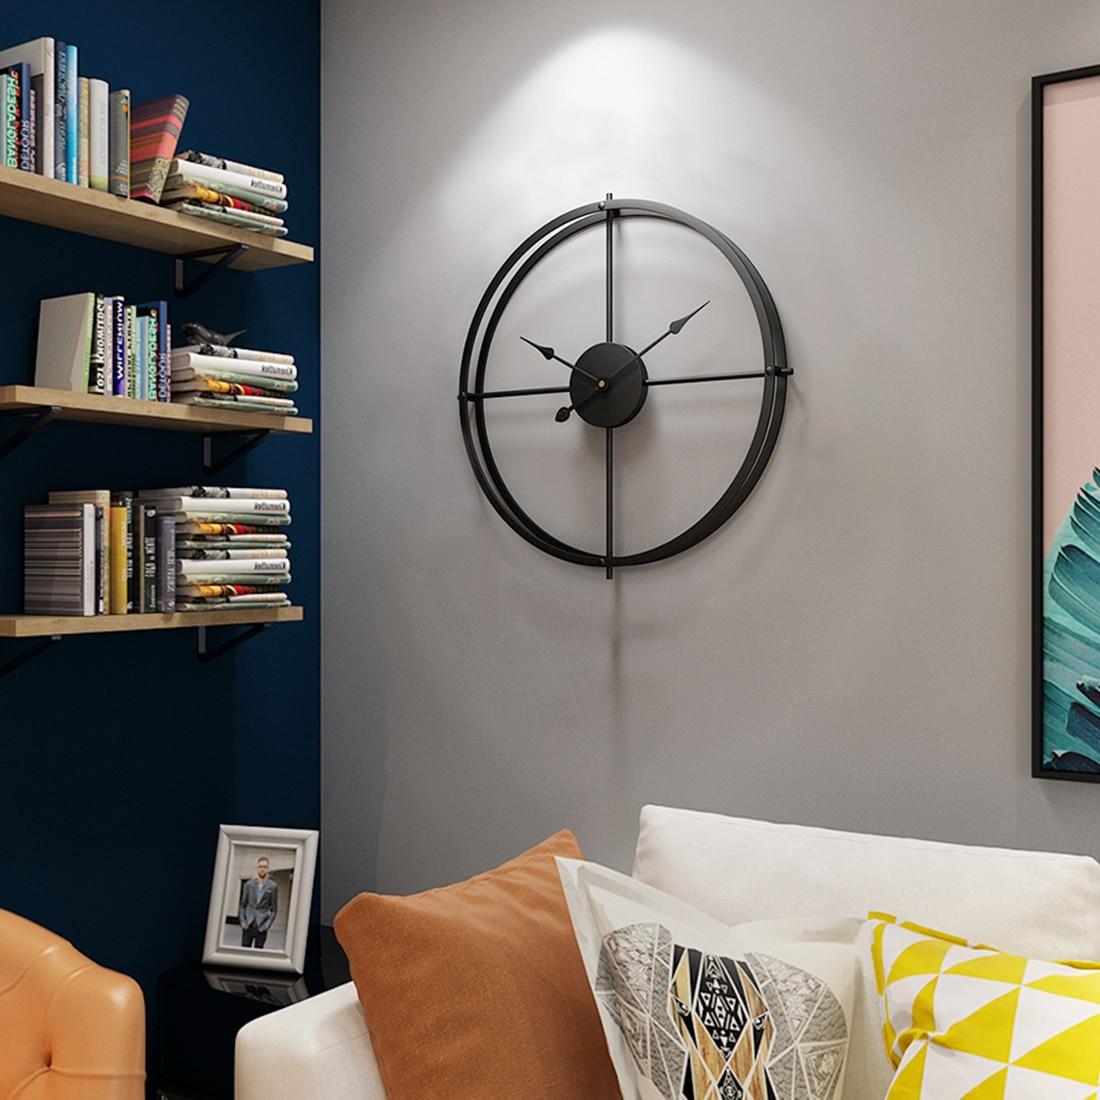 Homingdeco 40cm Silent Wall Clock Modern Design Clocks Home Decor Office European Style Hanging Wall Watch Clocks 2018